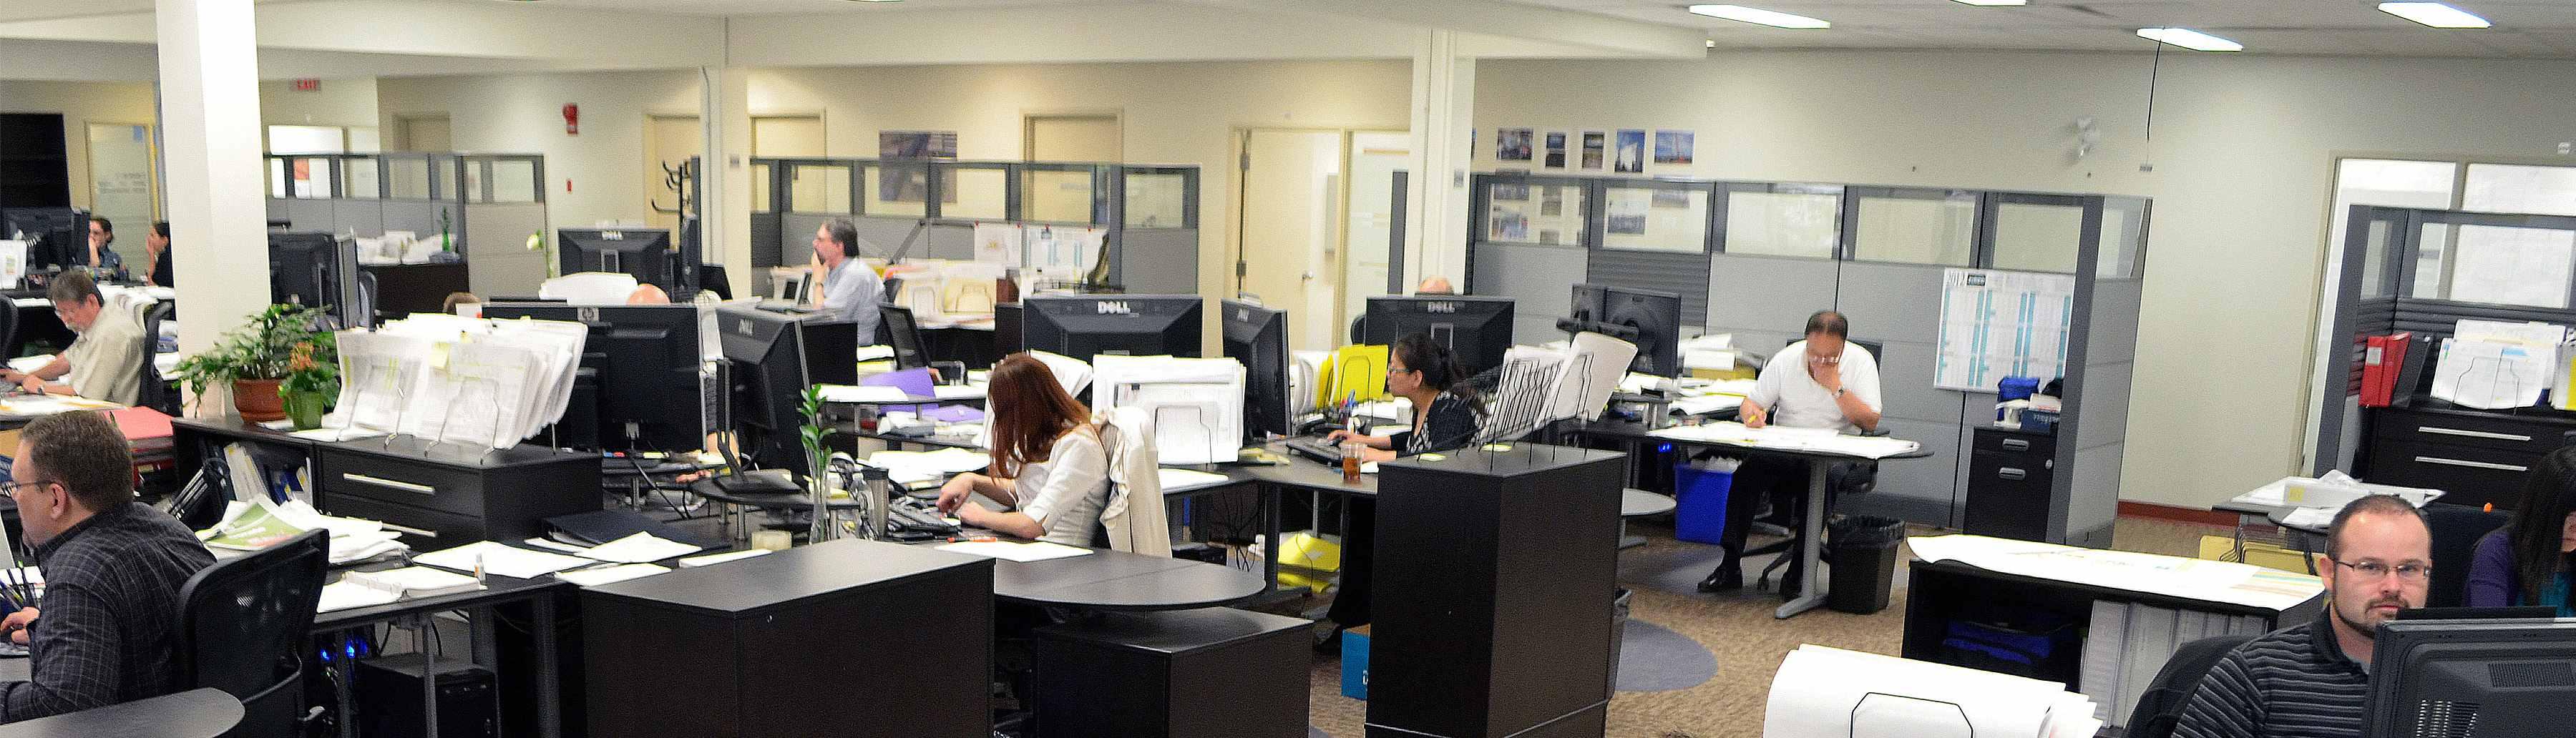 Drafting Services - Drafting company Calgary